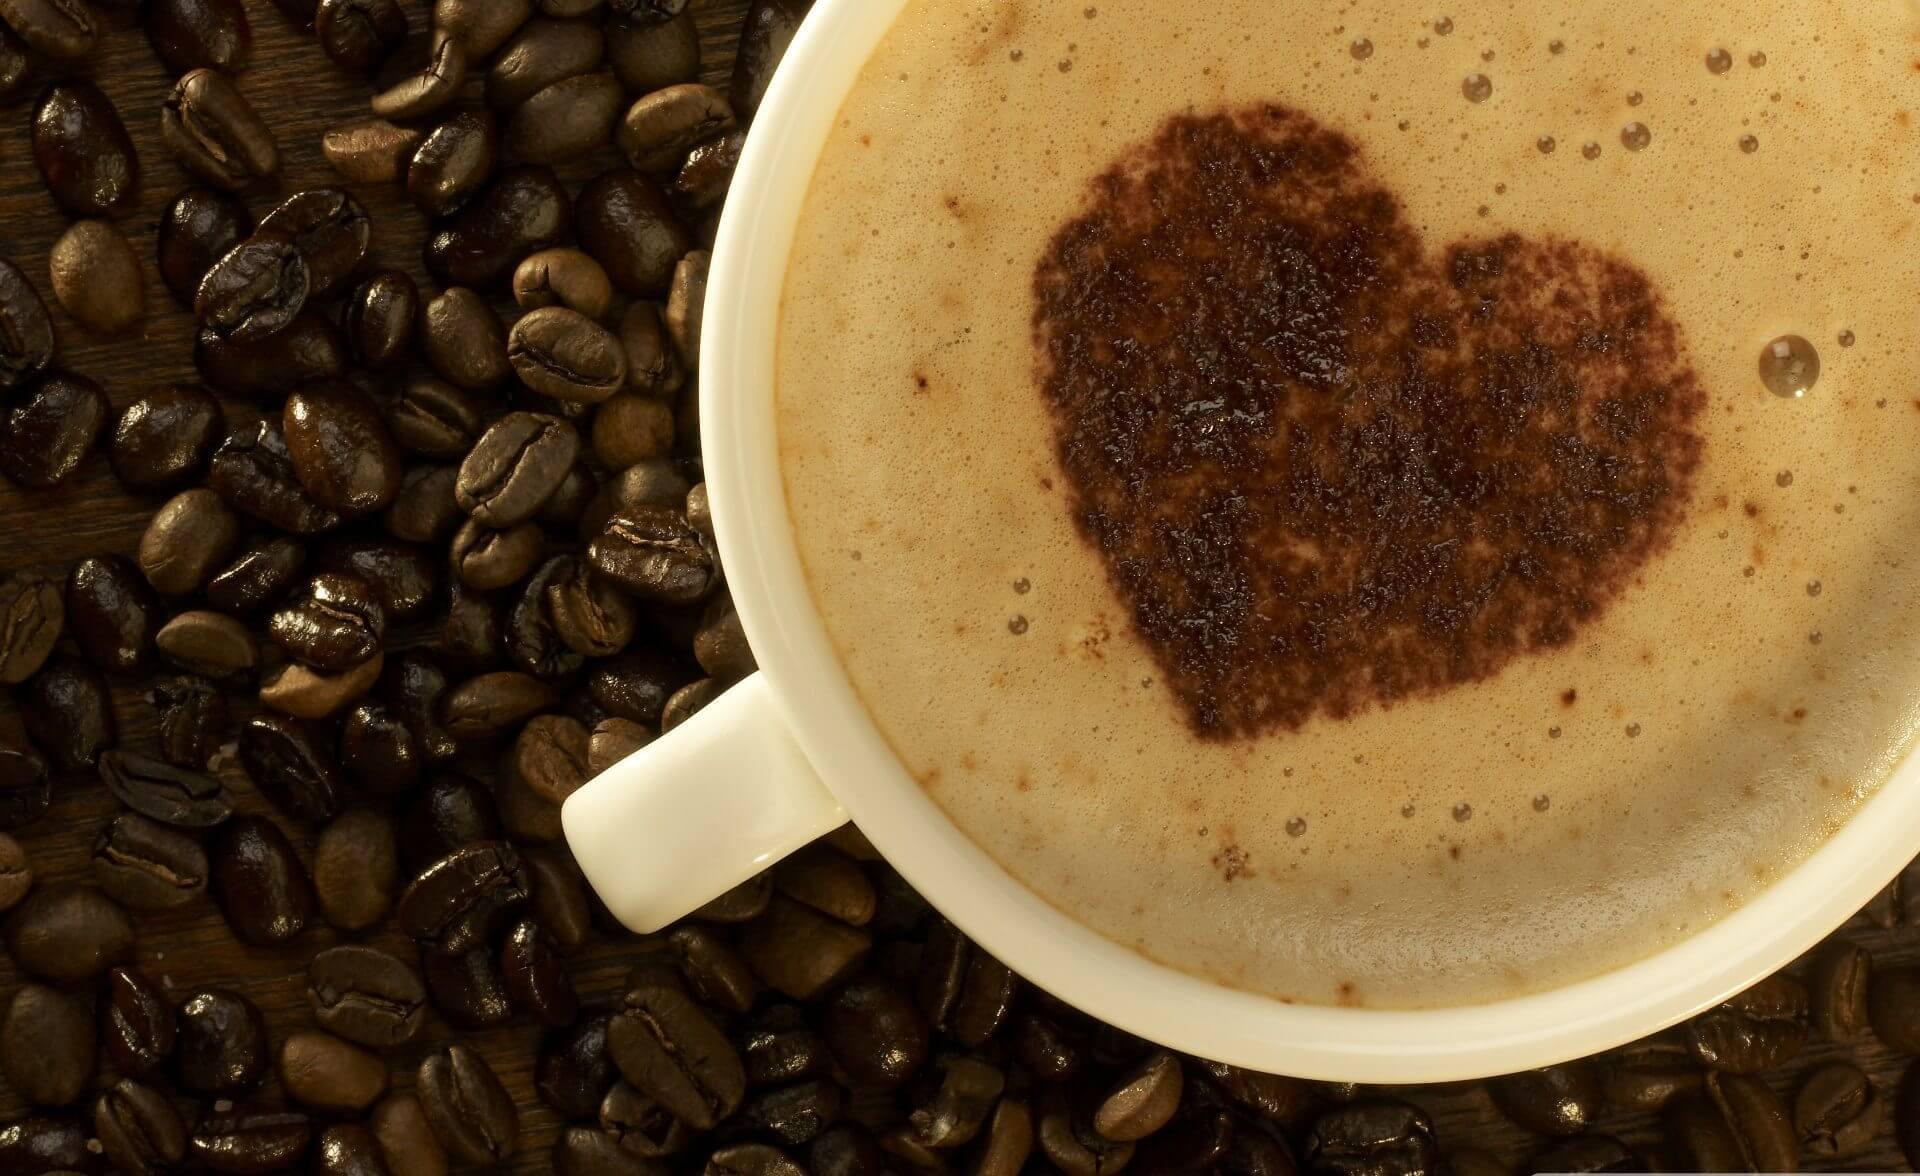 smt-Coffee-capa